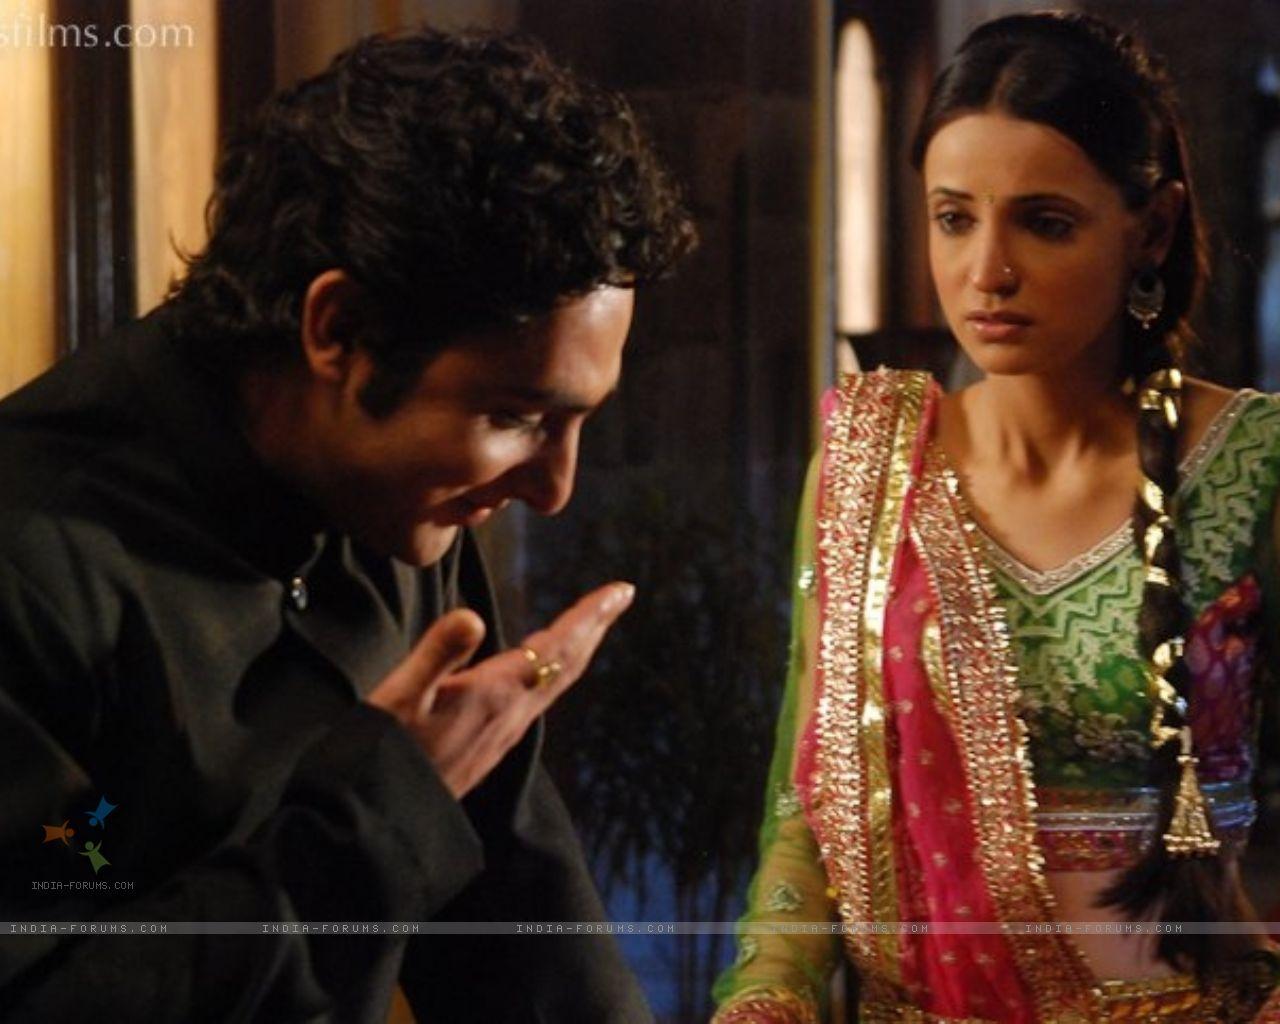 Madhubala was sad when Dilip Kumar got married - Madhur